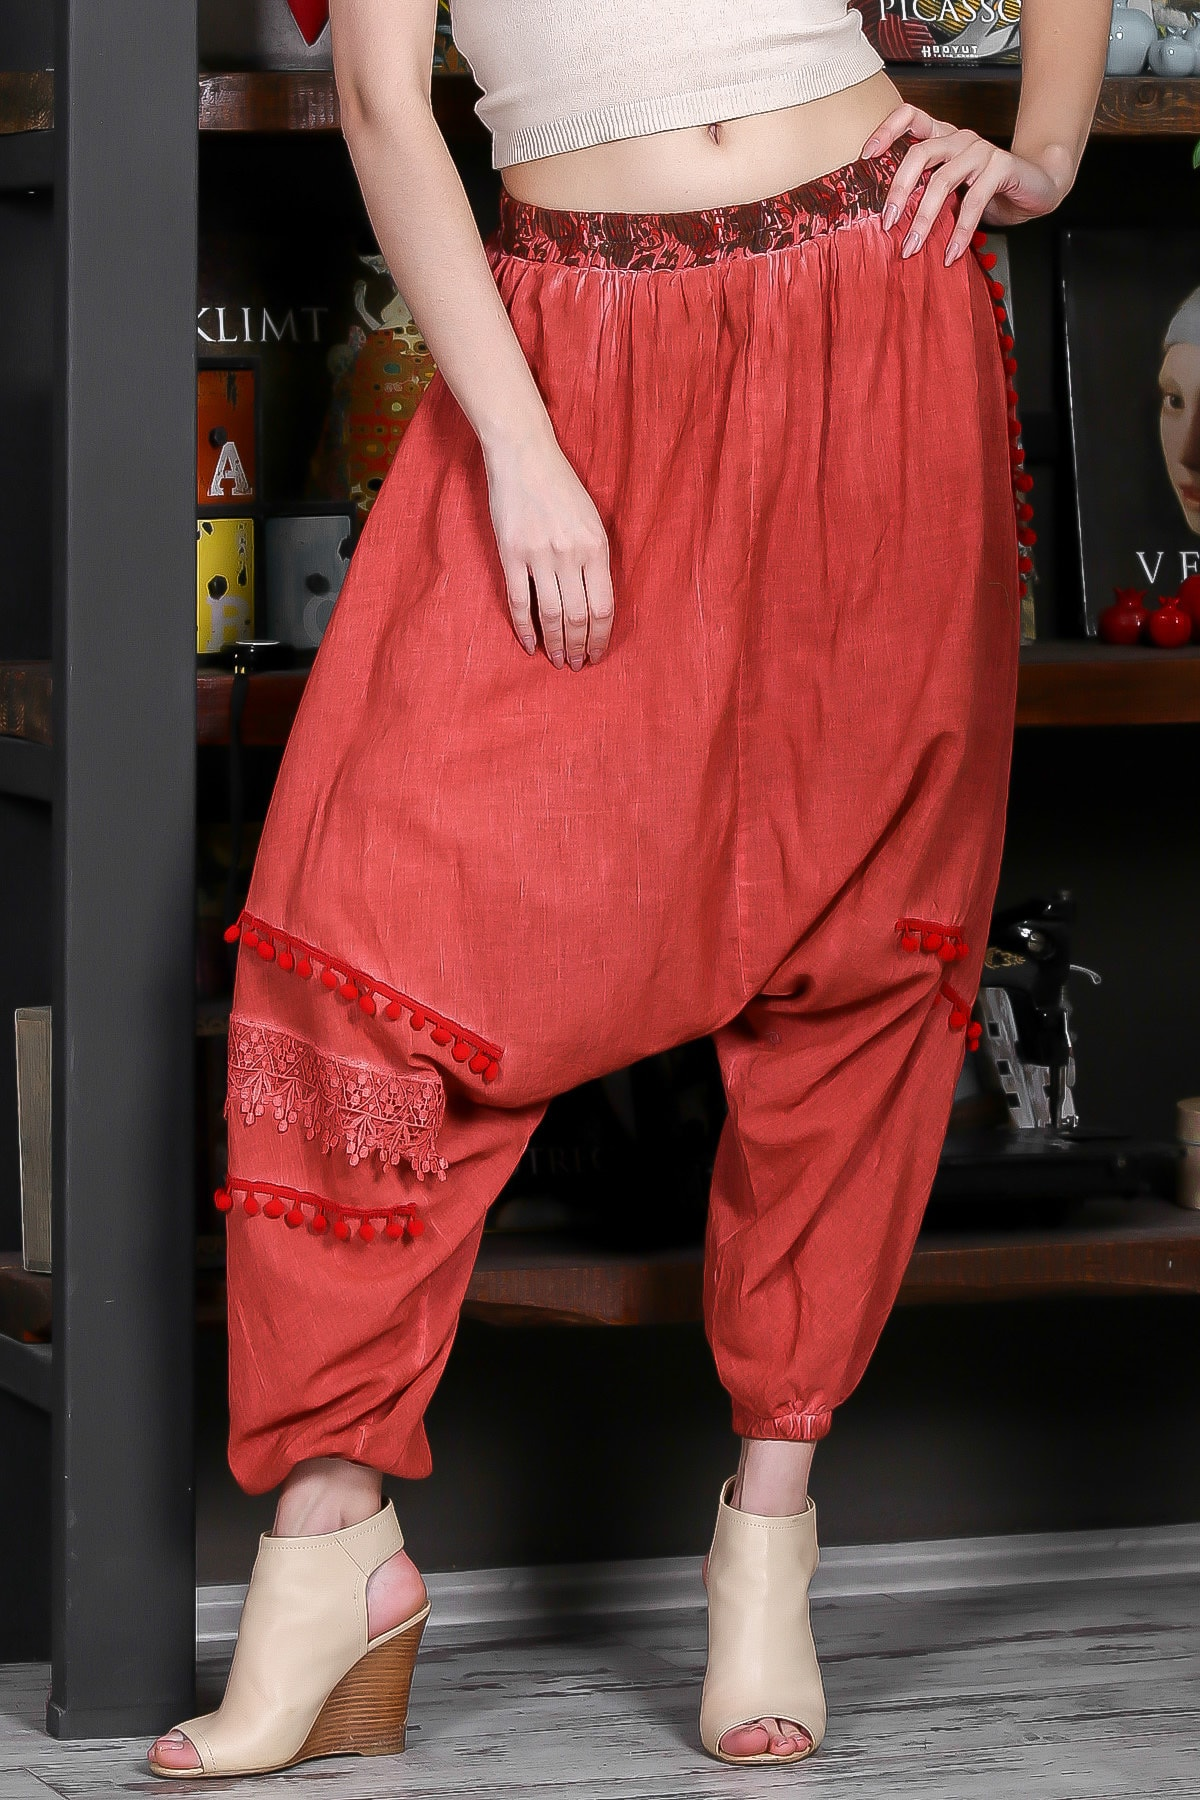 Chiccy Kadın Kiremit Beli Lastikli Ponpon Detaylı Dokuma Şalvar Pantolon M10060000PN98883